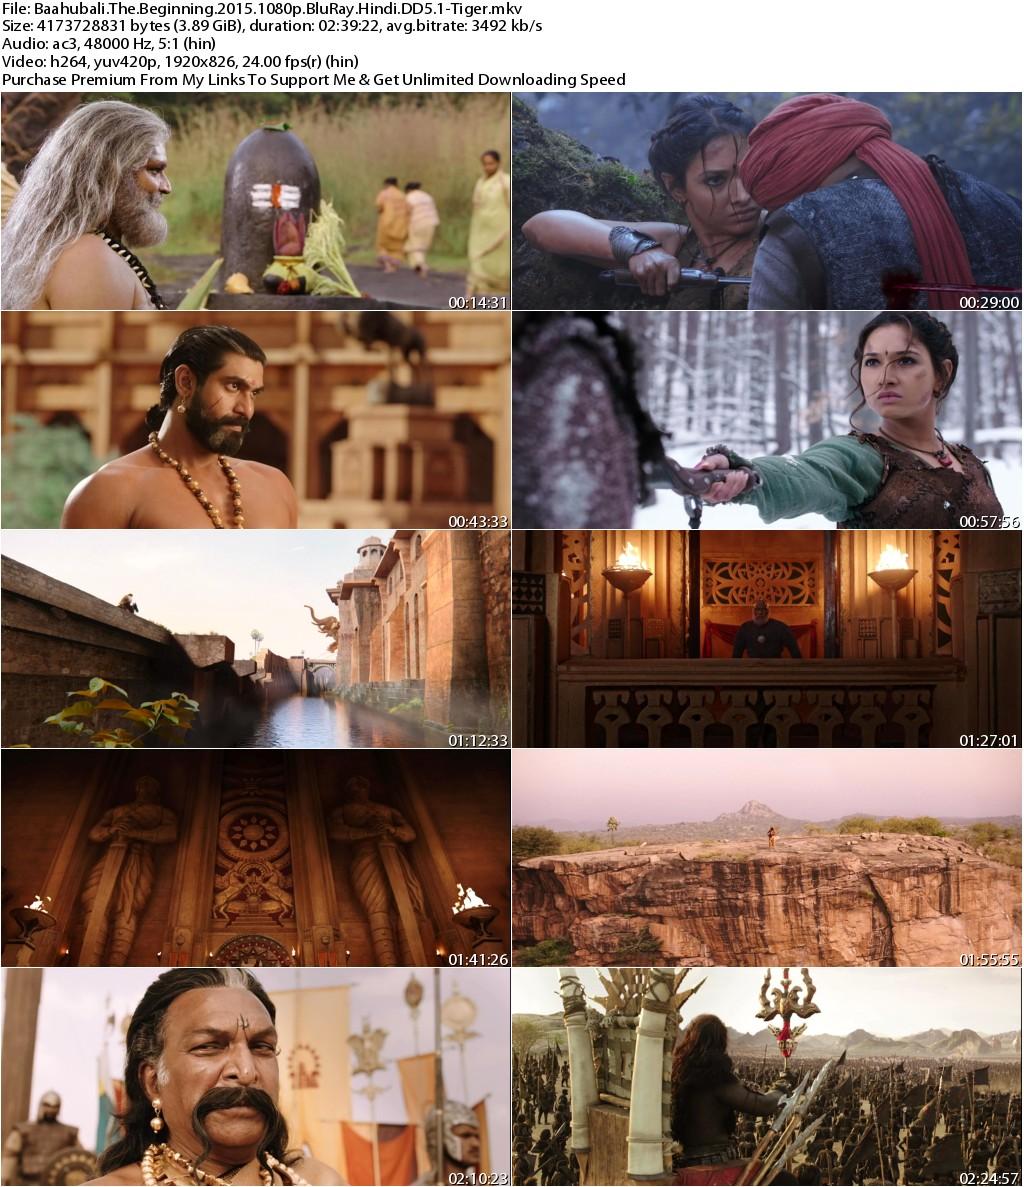 Baahubali The Beginning (2015) 1080p BluRay Hindi DD5.1-Tiger